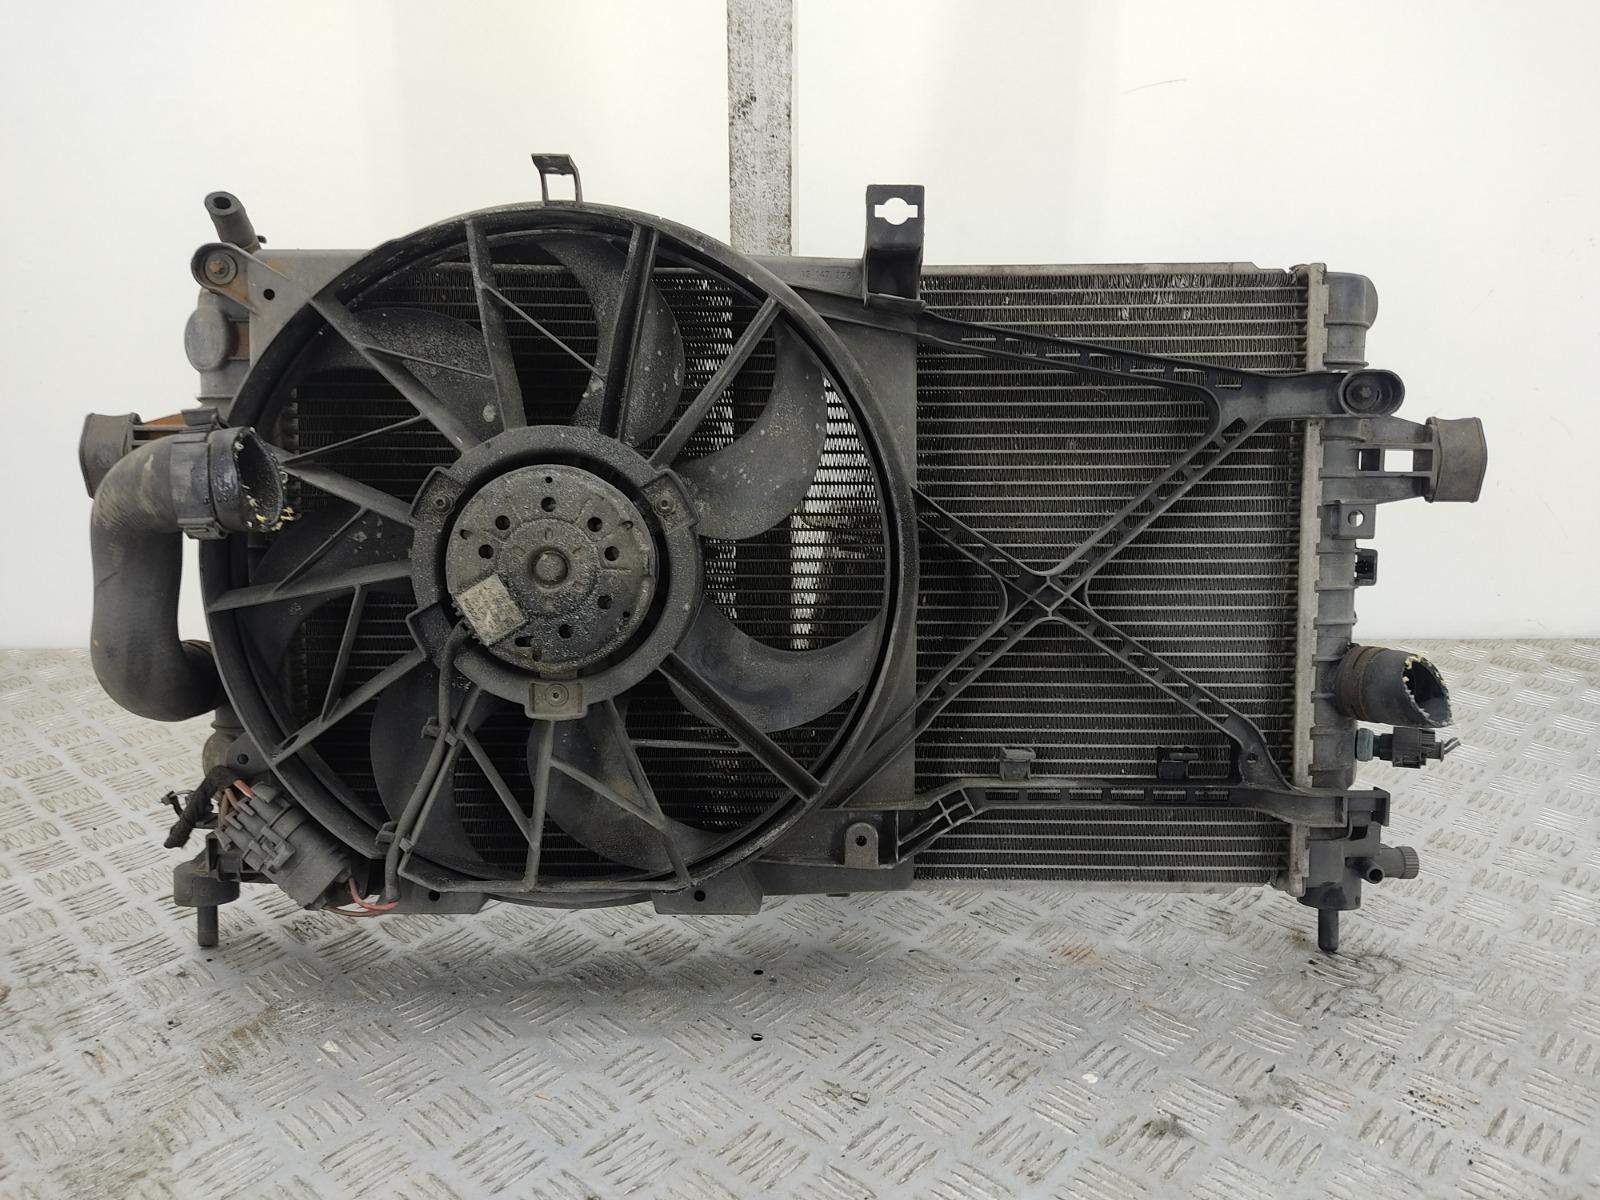 Кассета радиаторов Opel Zafira B 1.6 I 2009 (б/у)